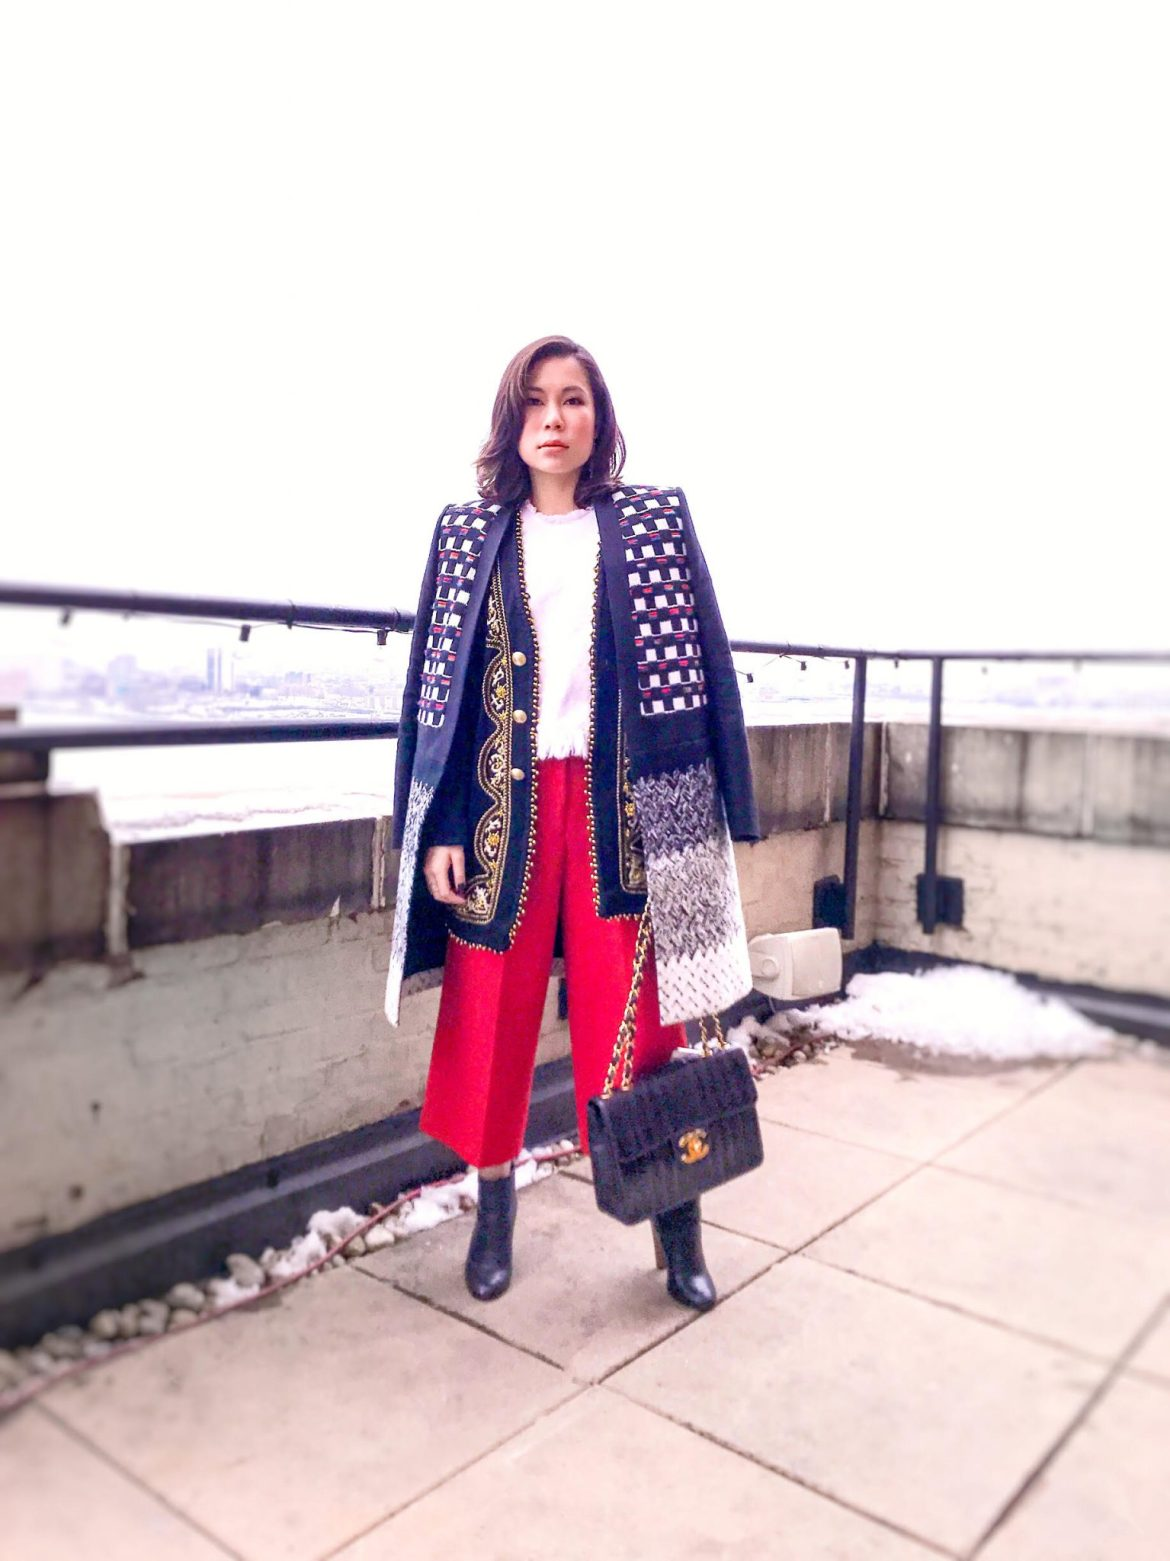 Jill stuart outfit1